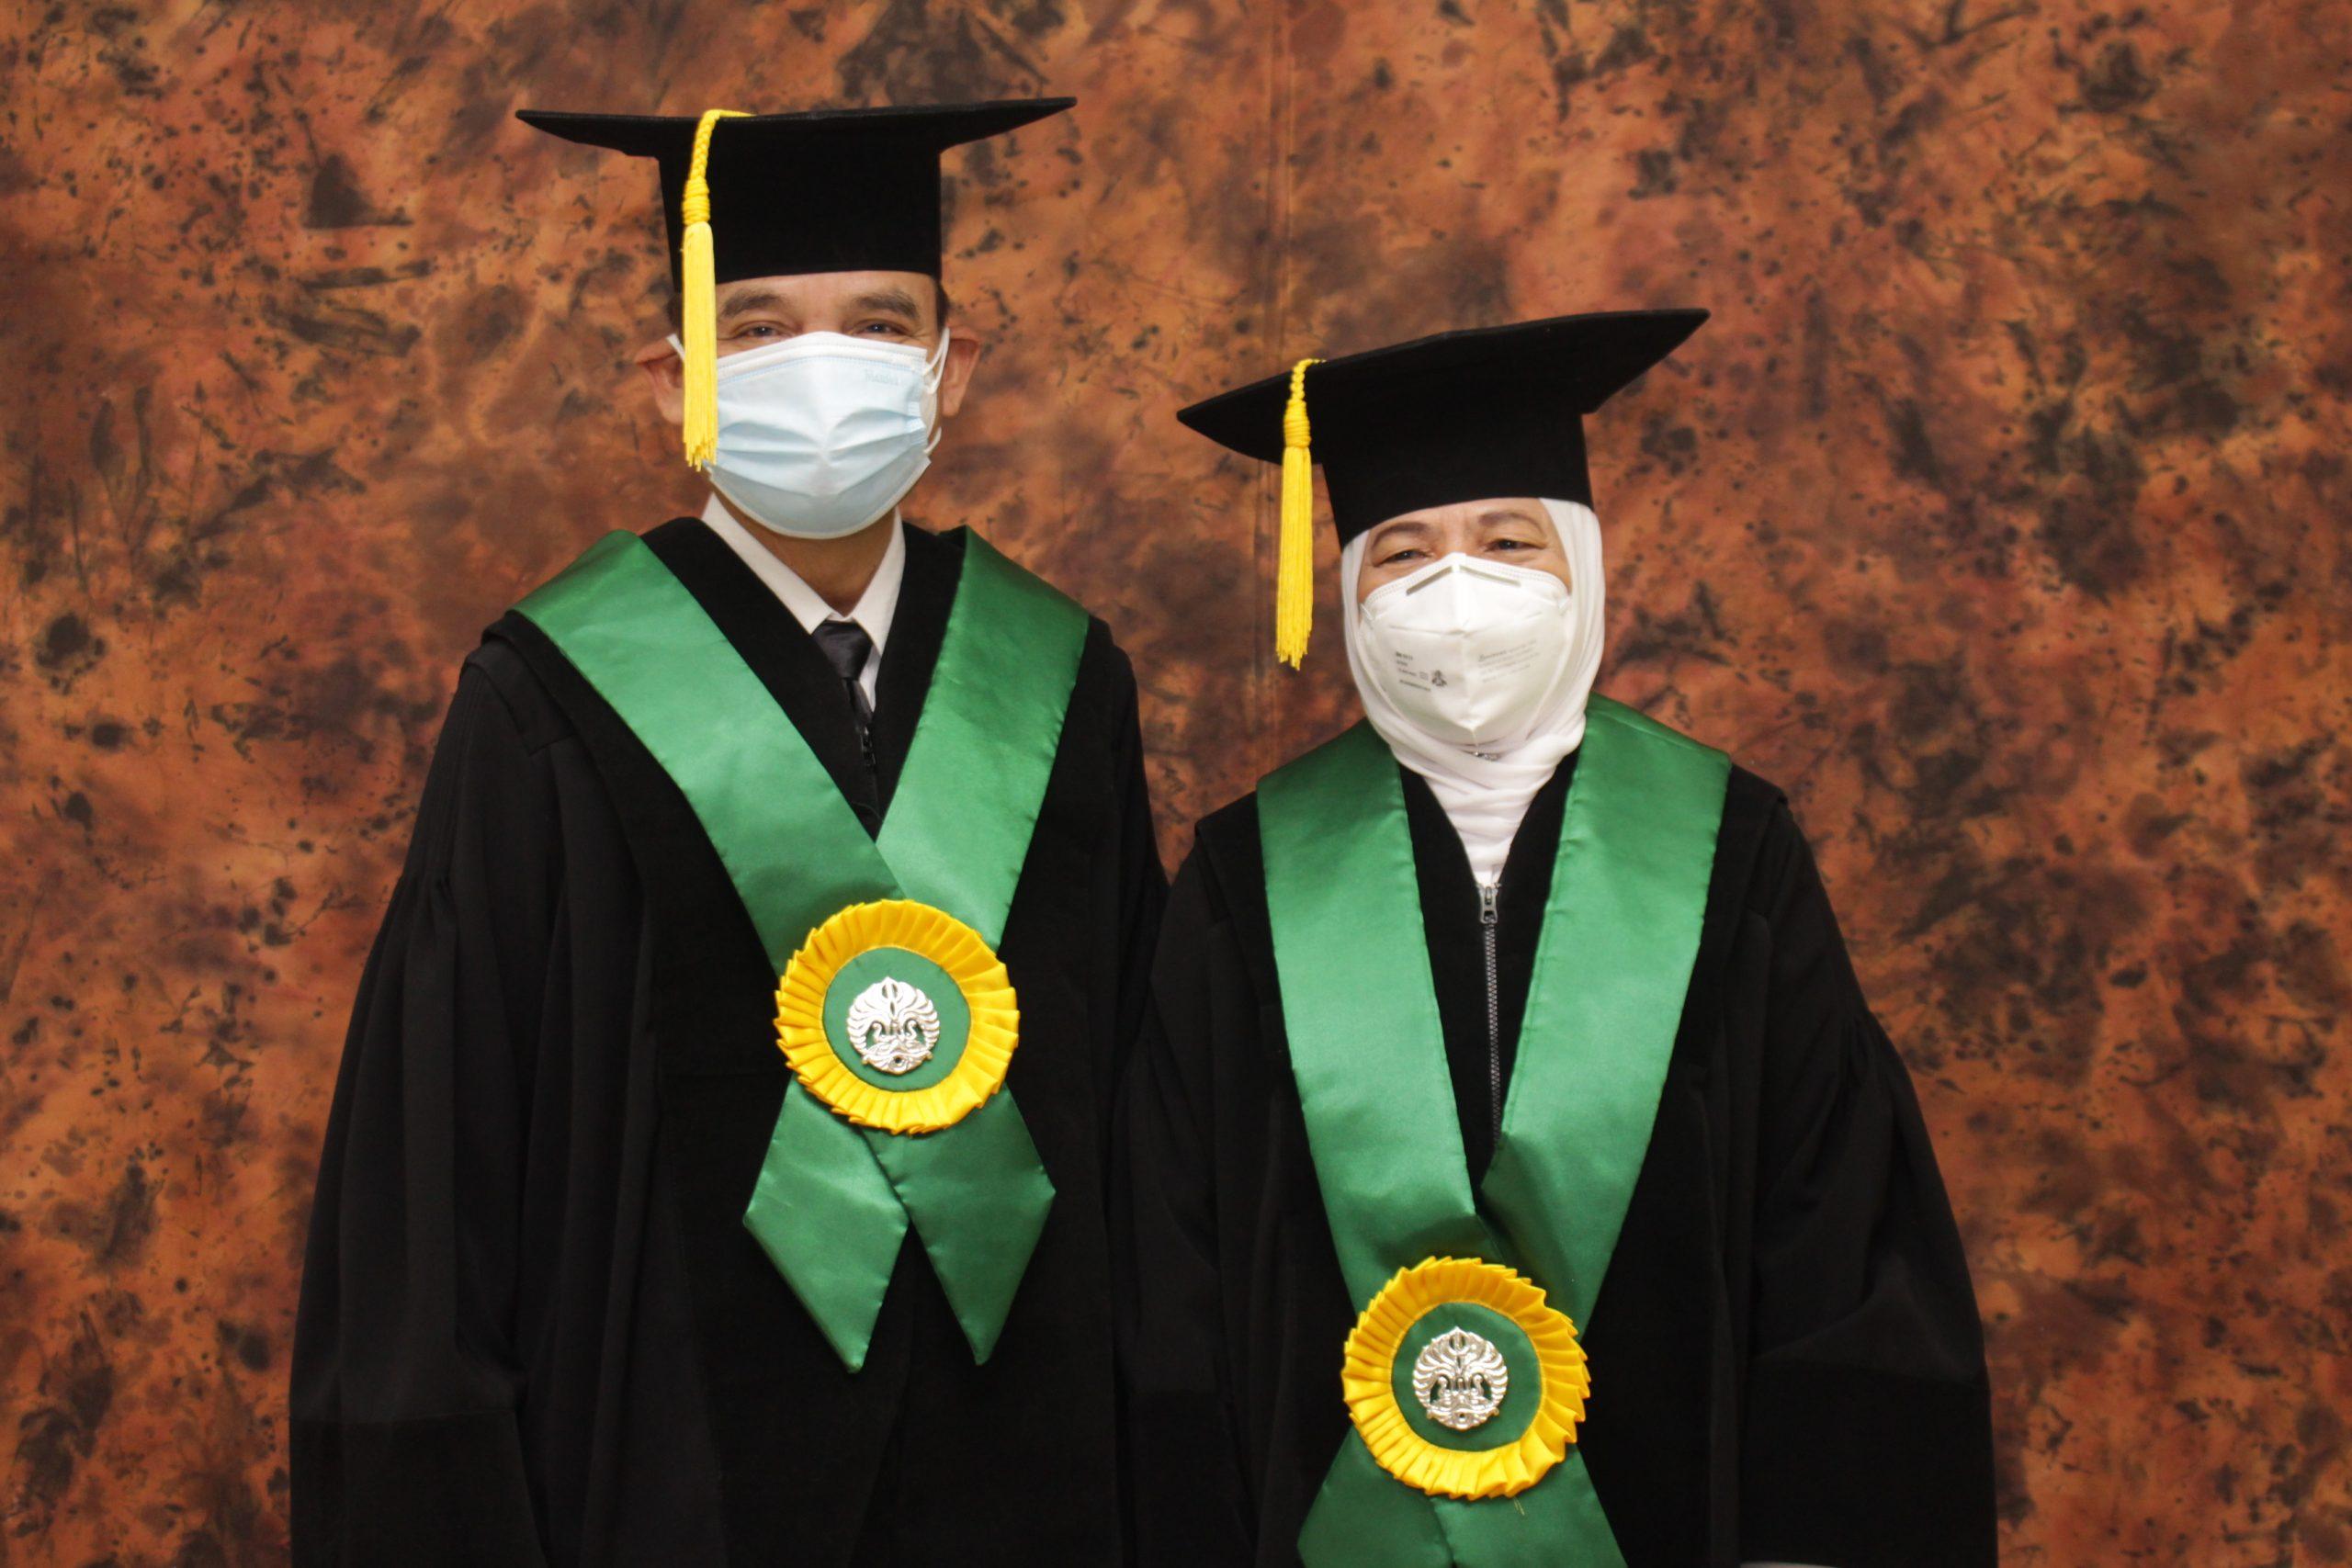 Pengukuhan Guru Besar Prof. dr.  Elisna Syahruddin,  Sp.P(K), Ph.D dan Prof. dr.  Muchtaruddin Mansyur, MS, PKK, PGDRM, Sp.Ok., Ph.D